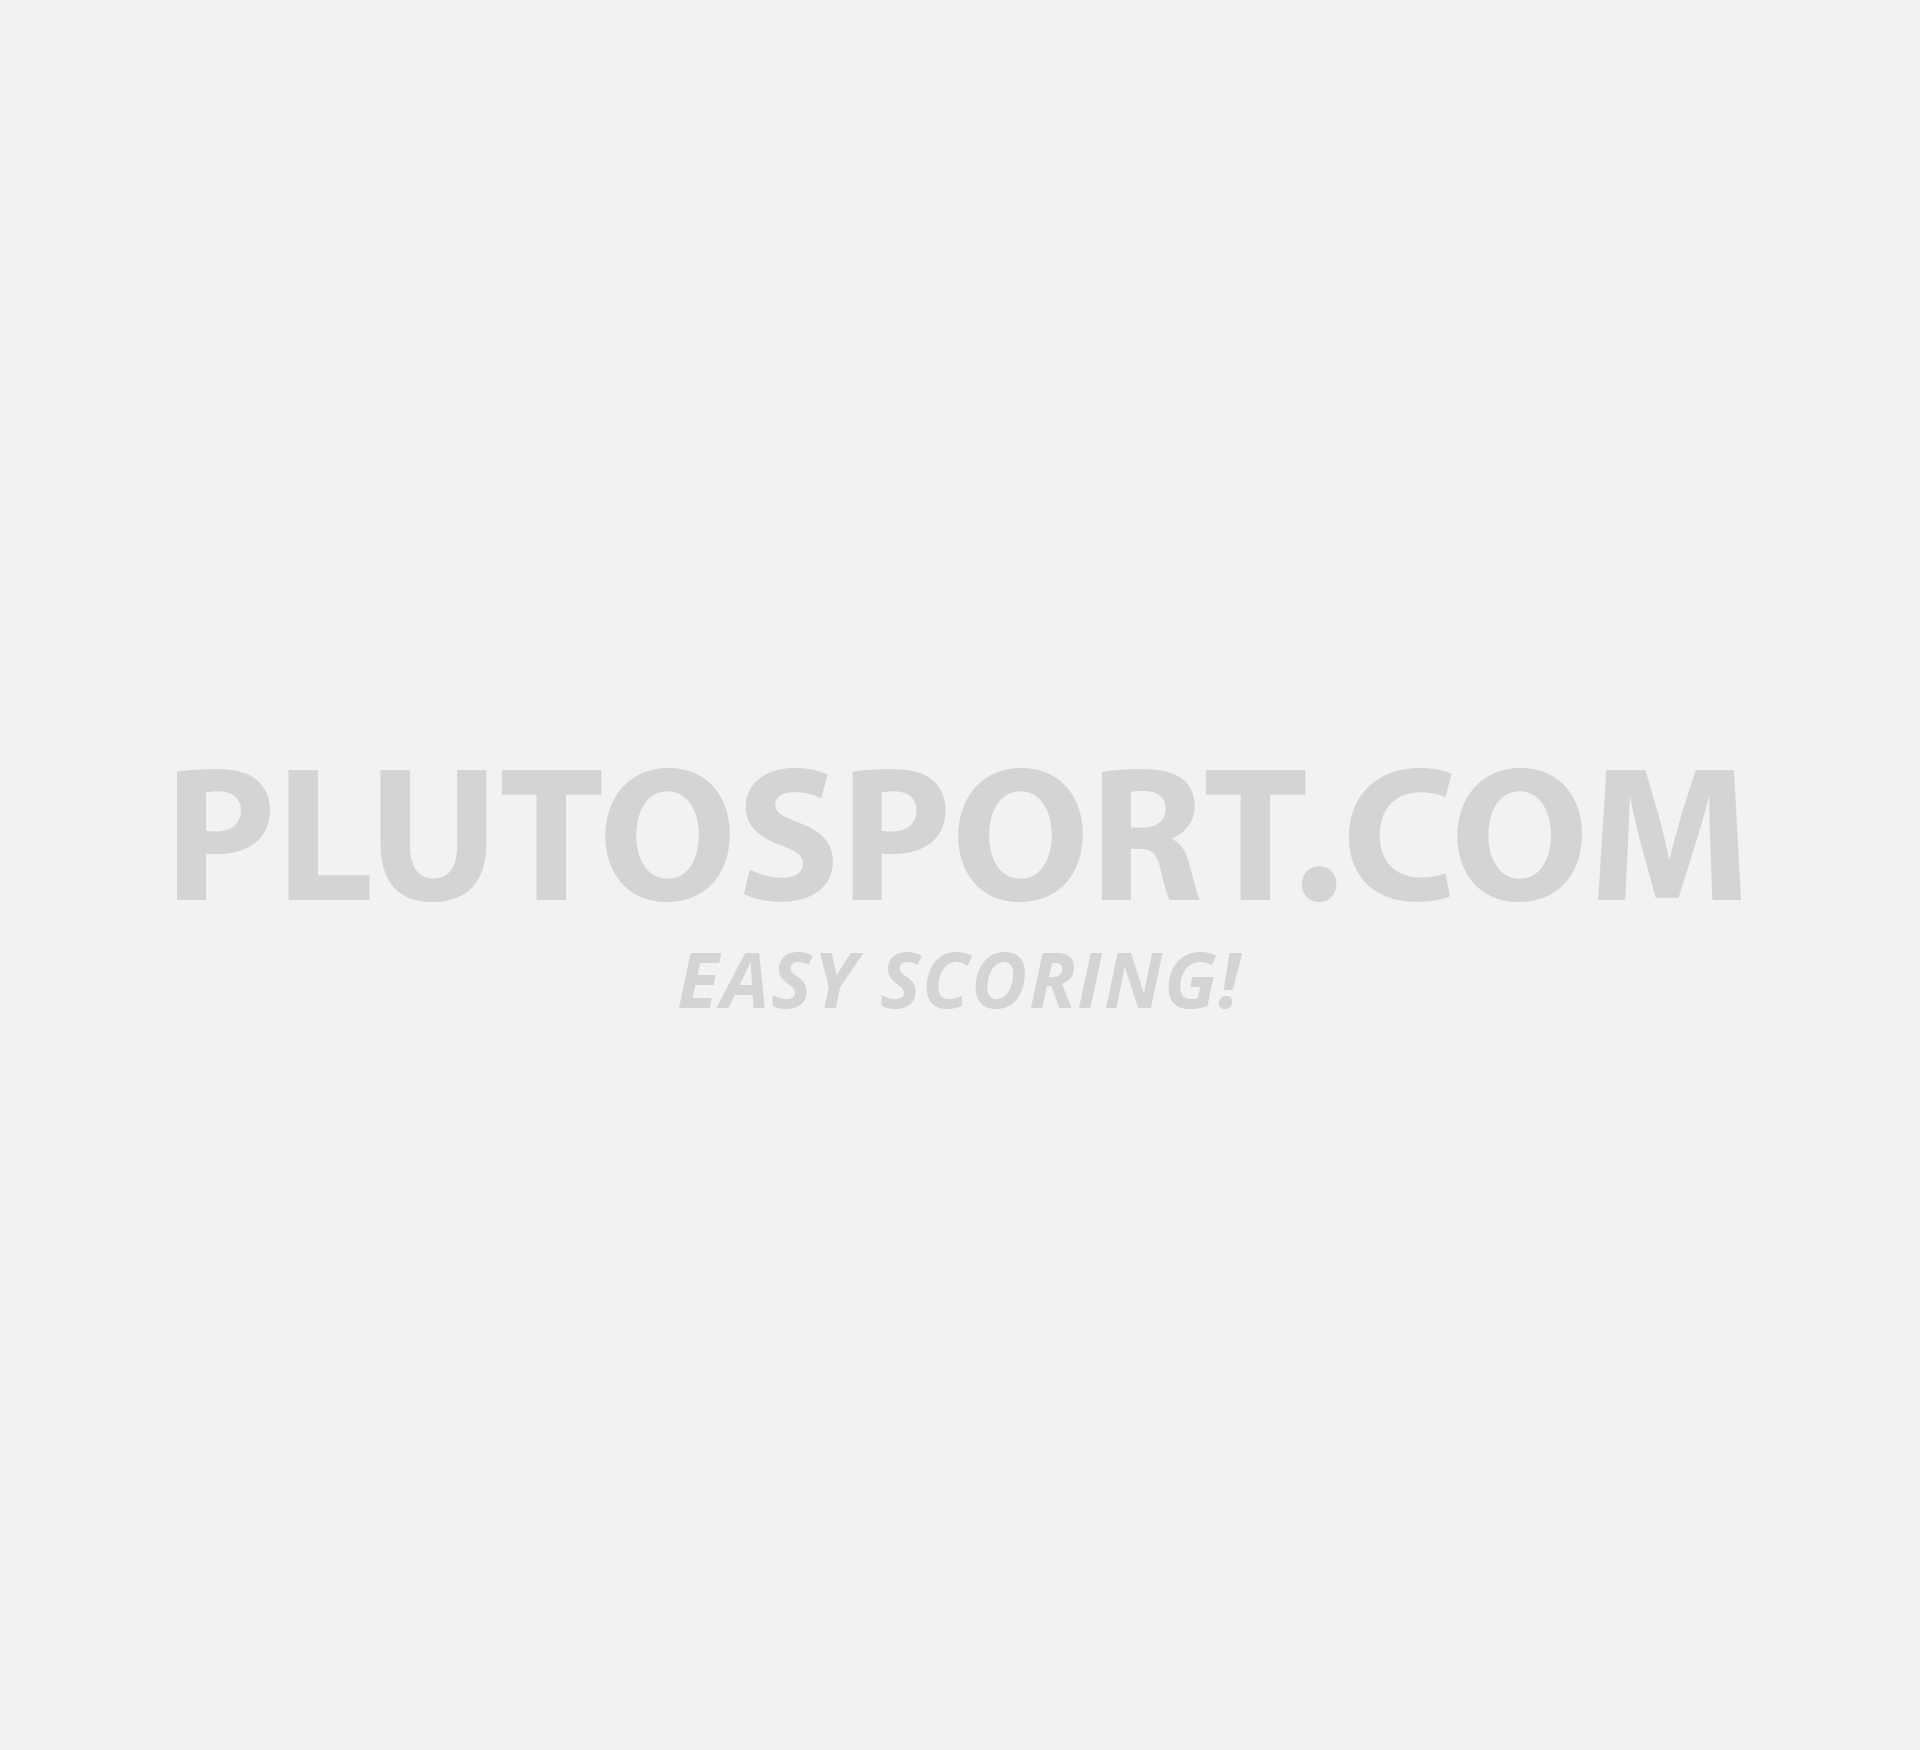 Asics Gel-Rocket 6 Indoorshoes Men - Shoes - Volleyball - Sports .